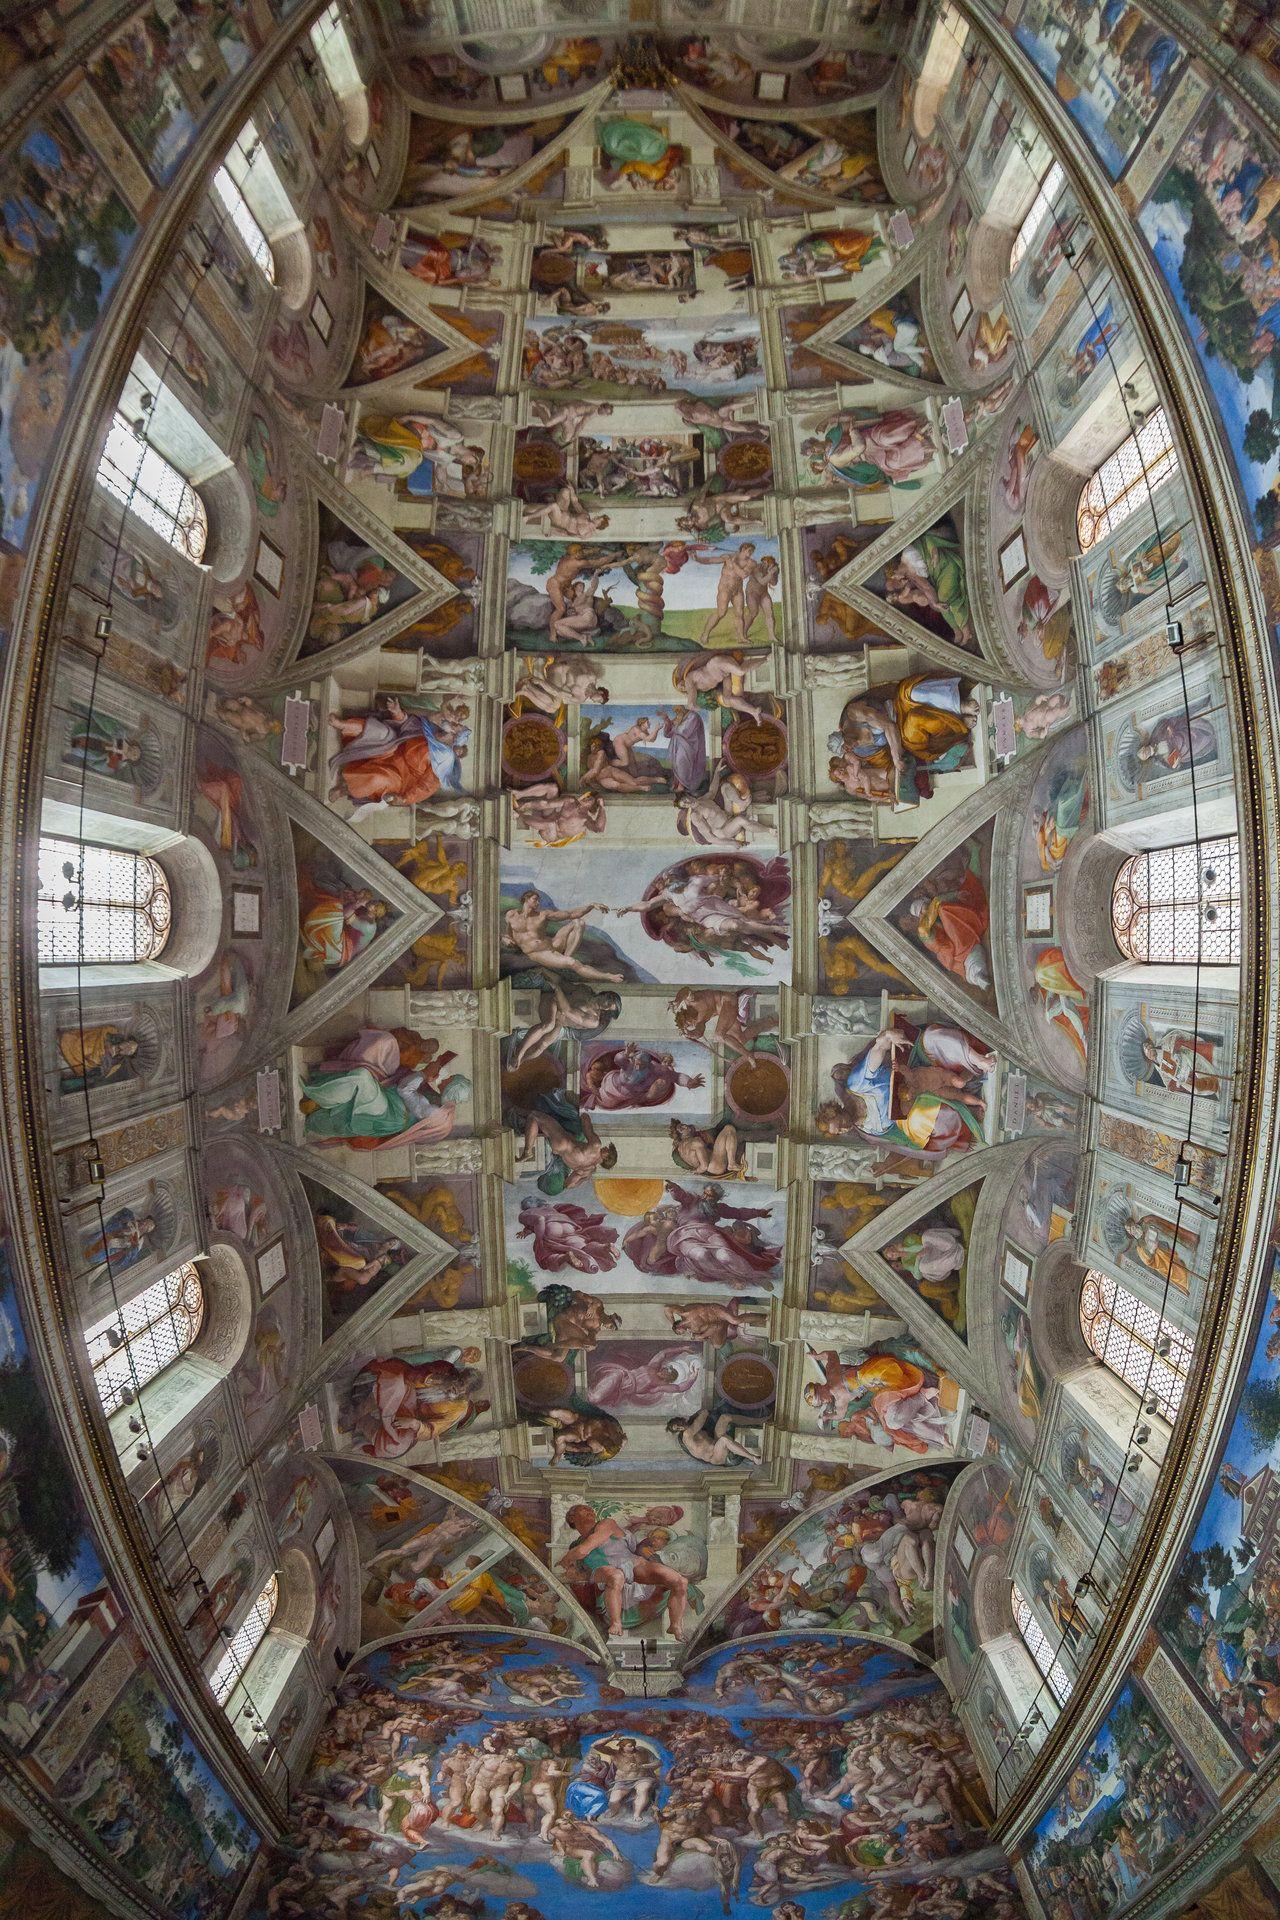 Las Mejores 190 Ideas De La Sixtina Capilla Sixtina Renacentismo Pintores Italianos